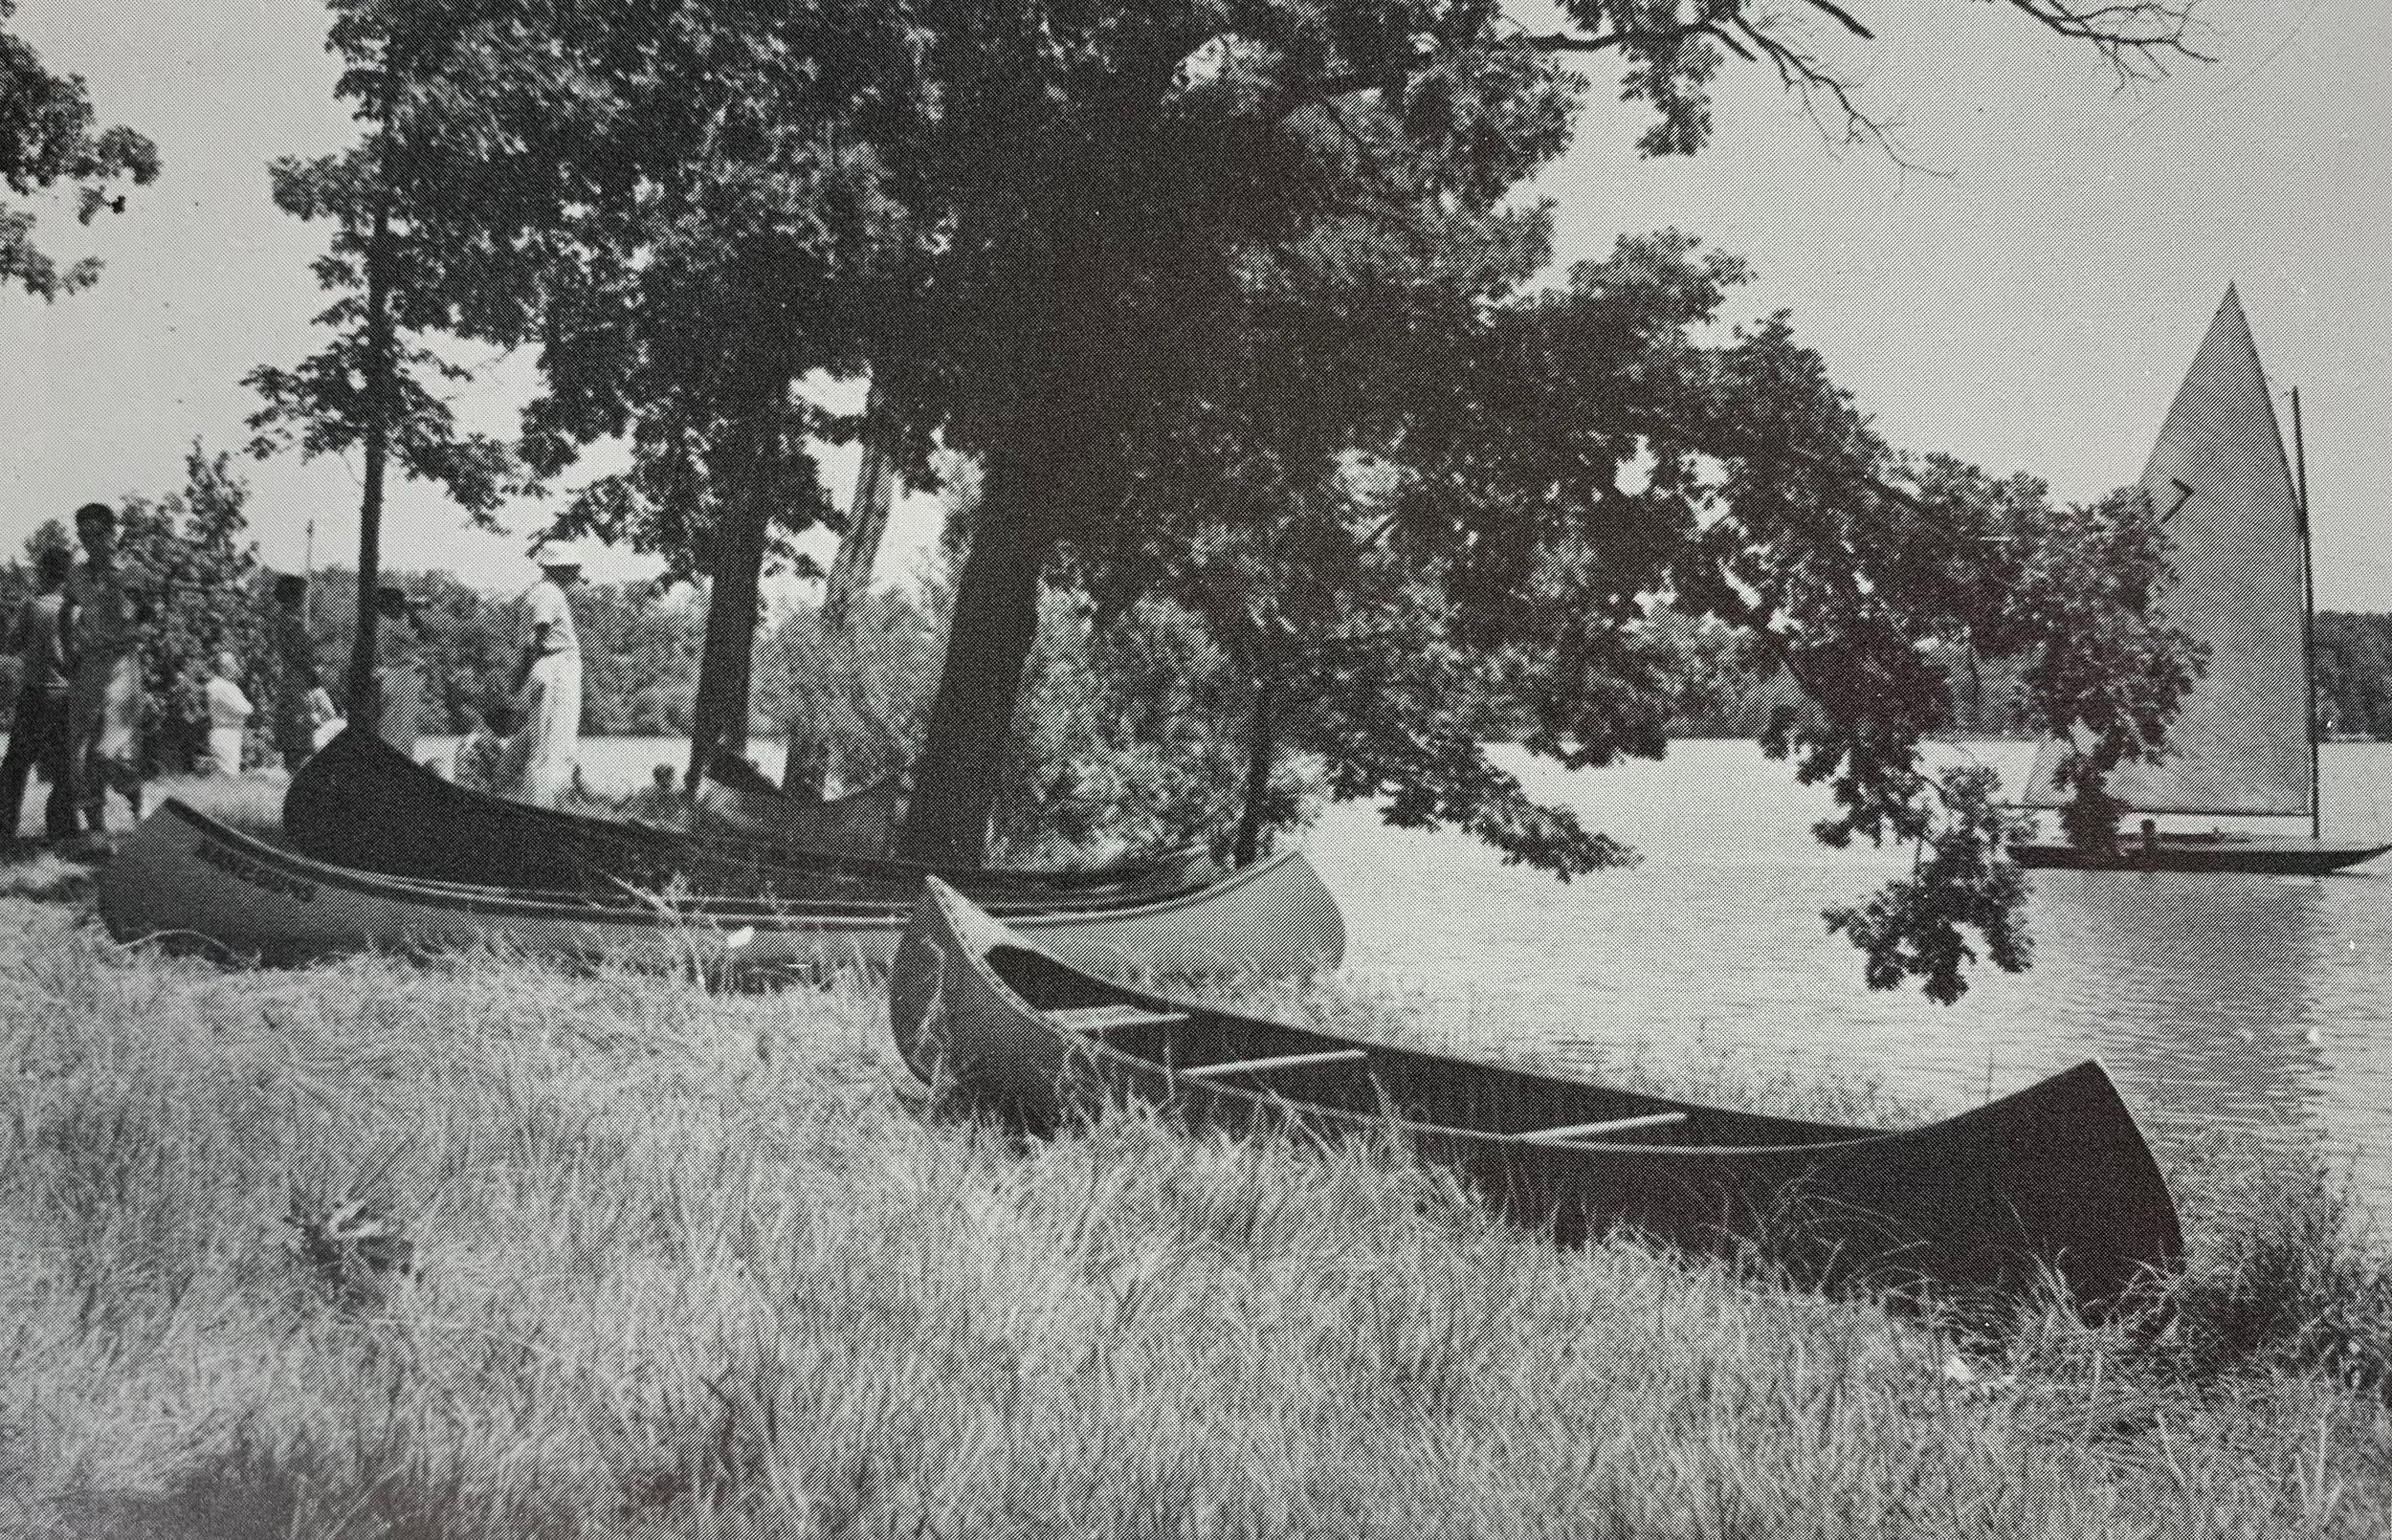 Lake_Beulah_History_LBYC-010.jpg